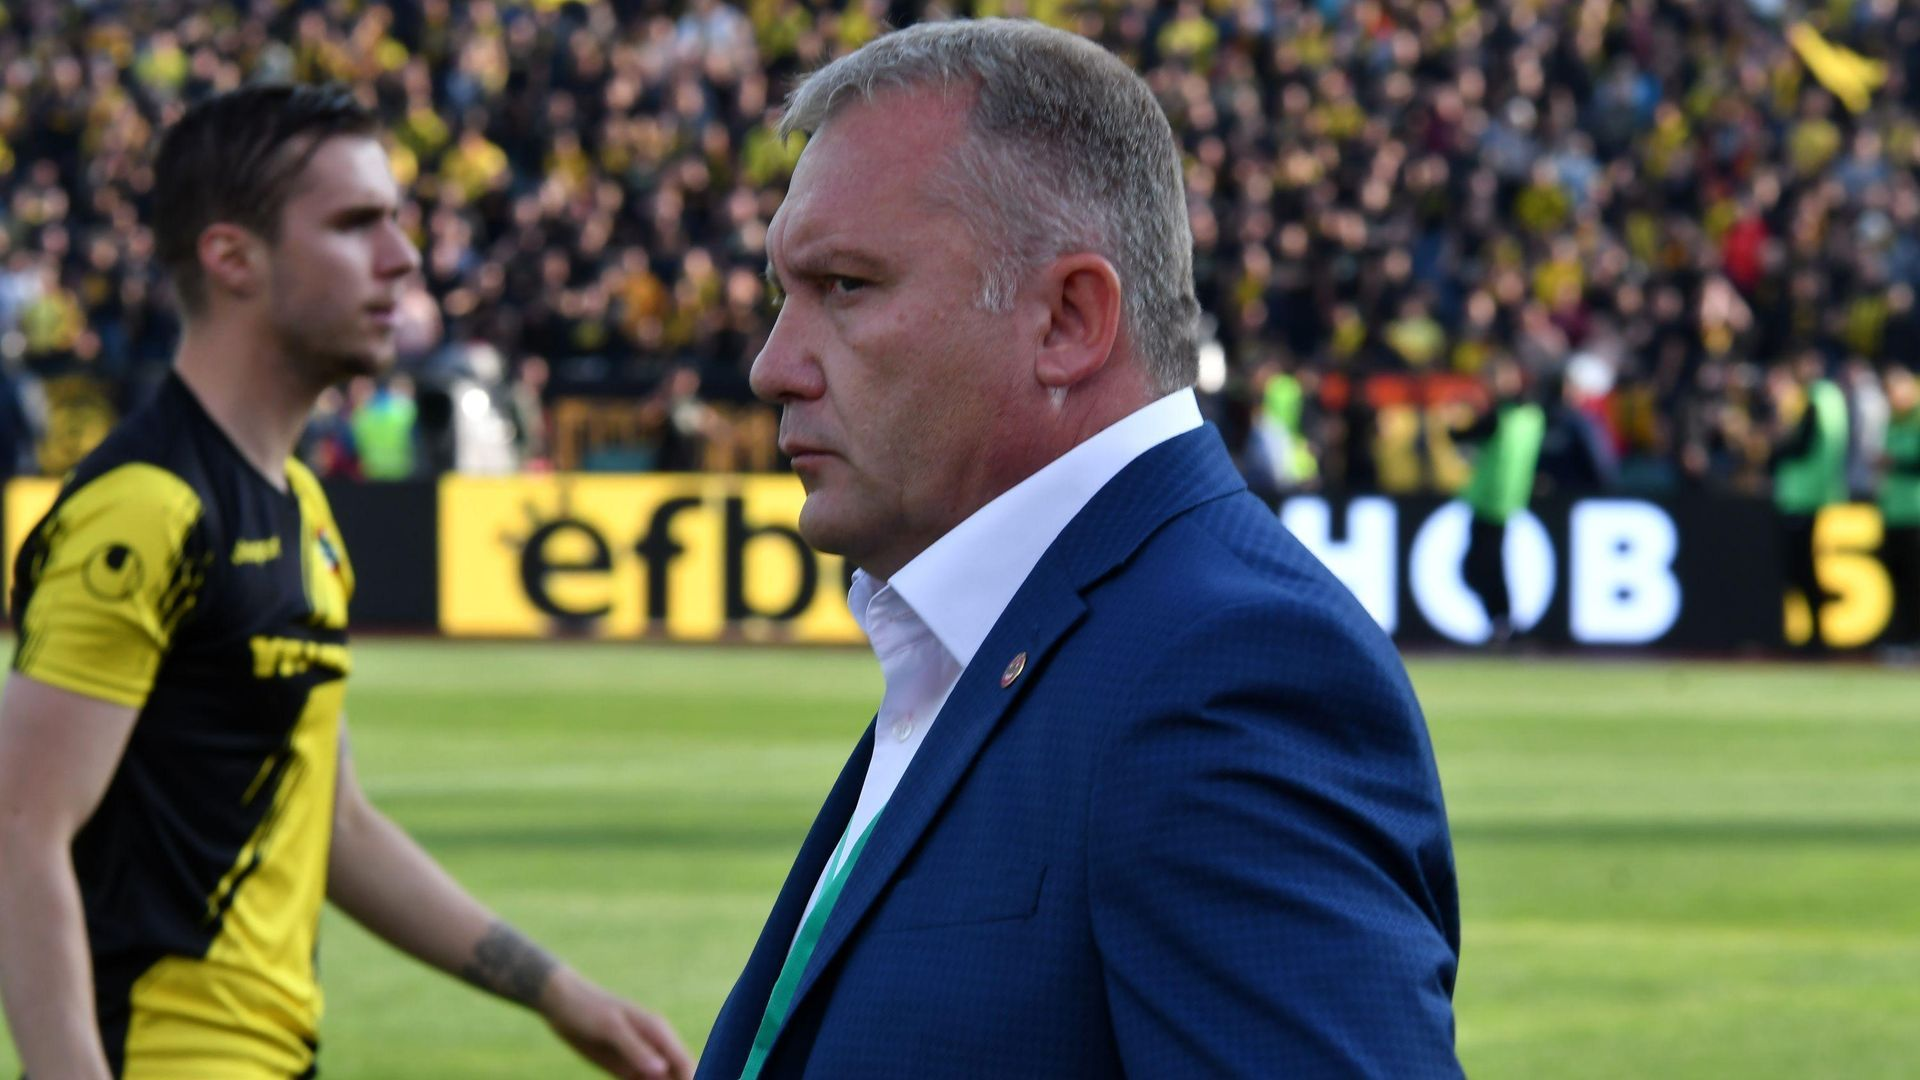 Треньорът на Ботев: Една грешка реши мача, ние я направихме